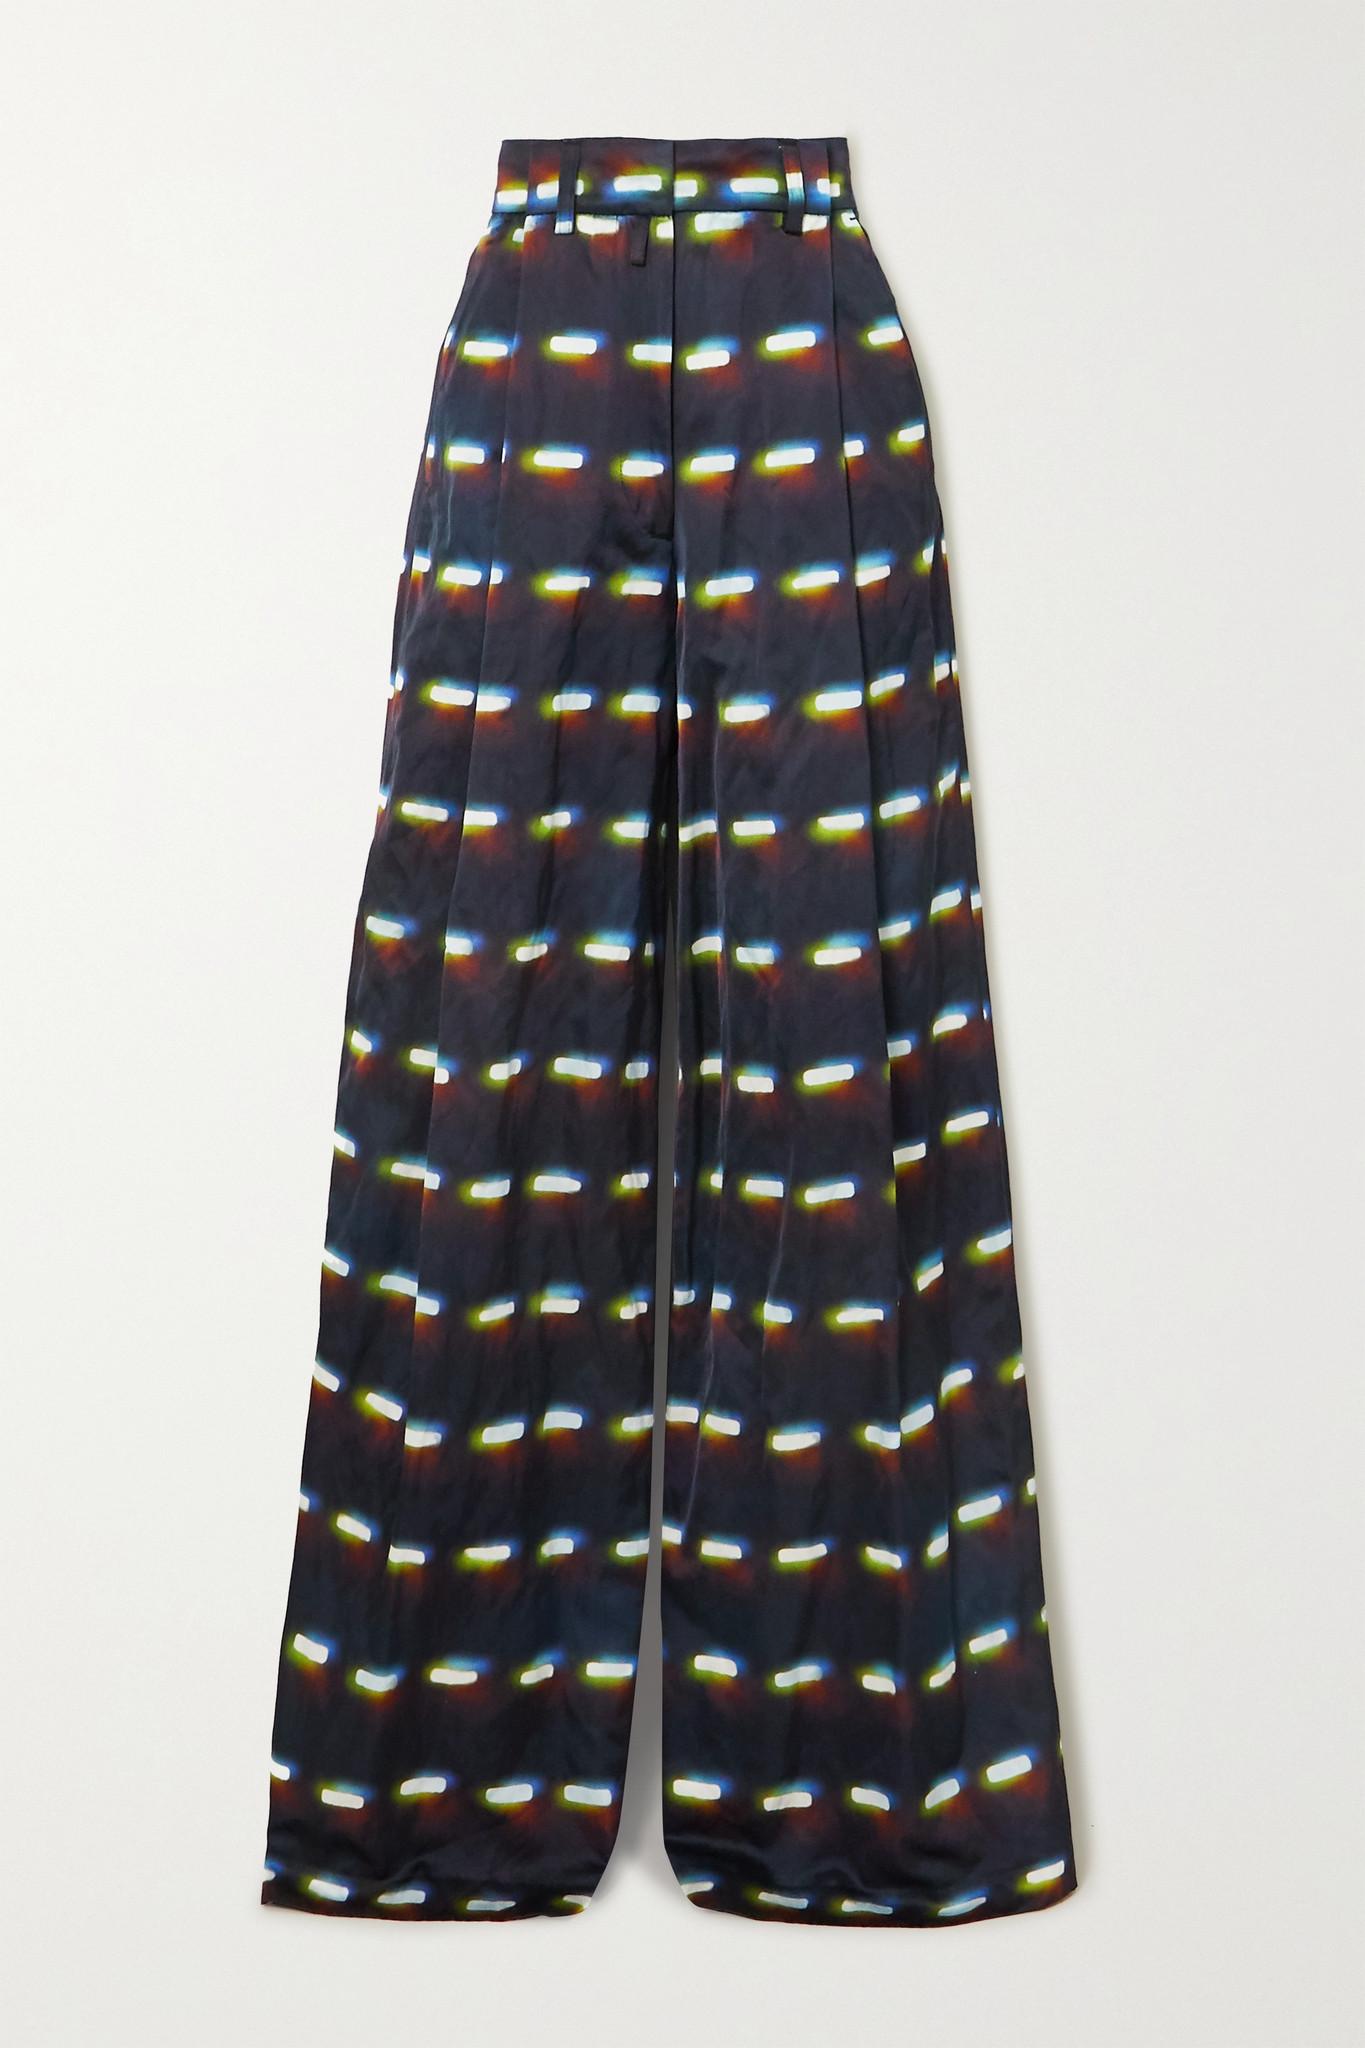 DRIES VAN NOTEN - Podium Printed Woven Wide-leg Pants - Black - FR40